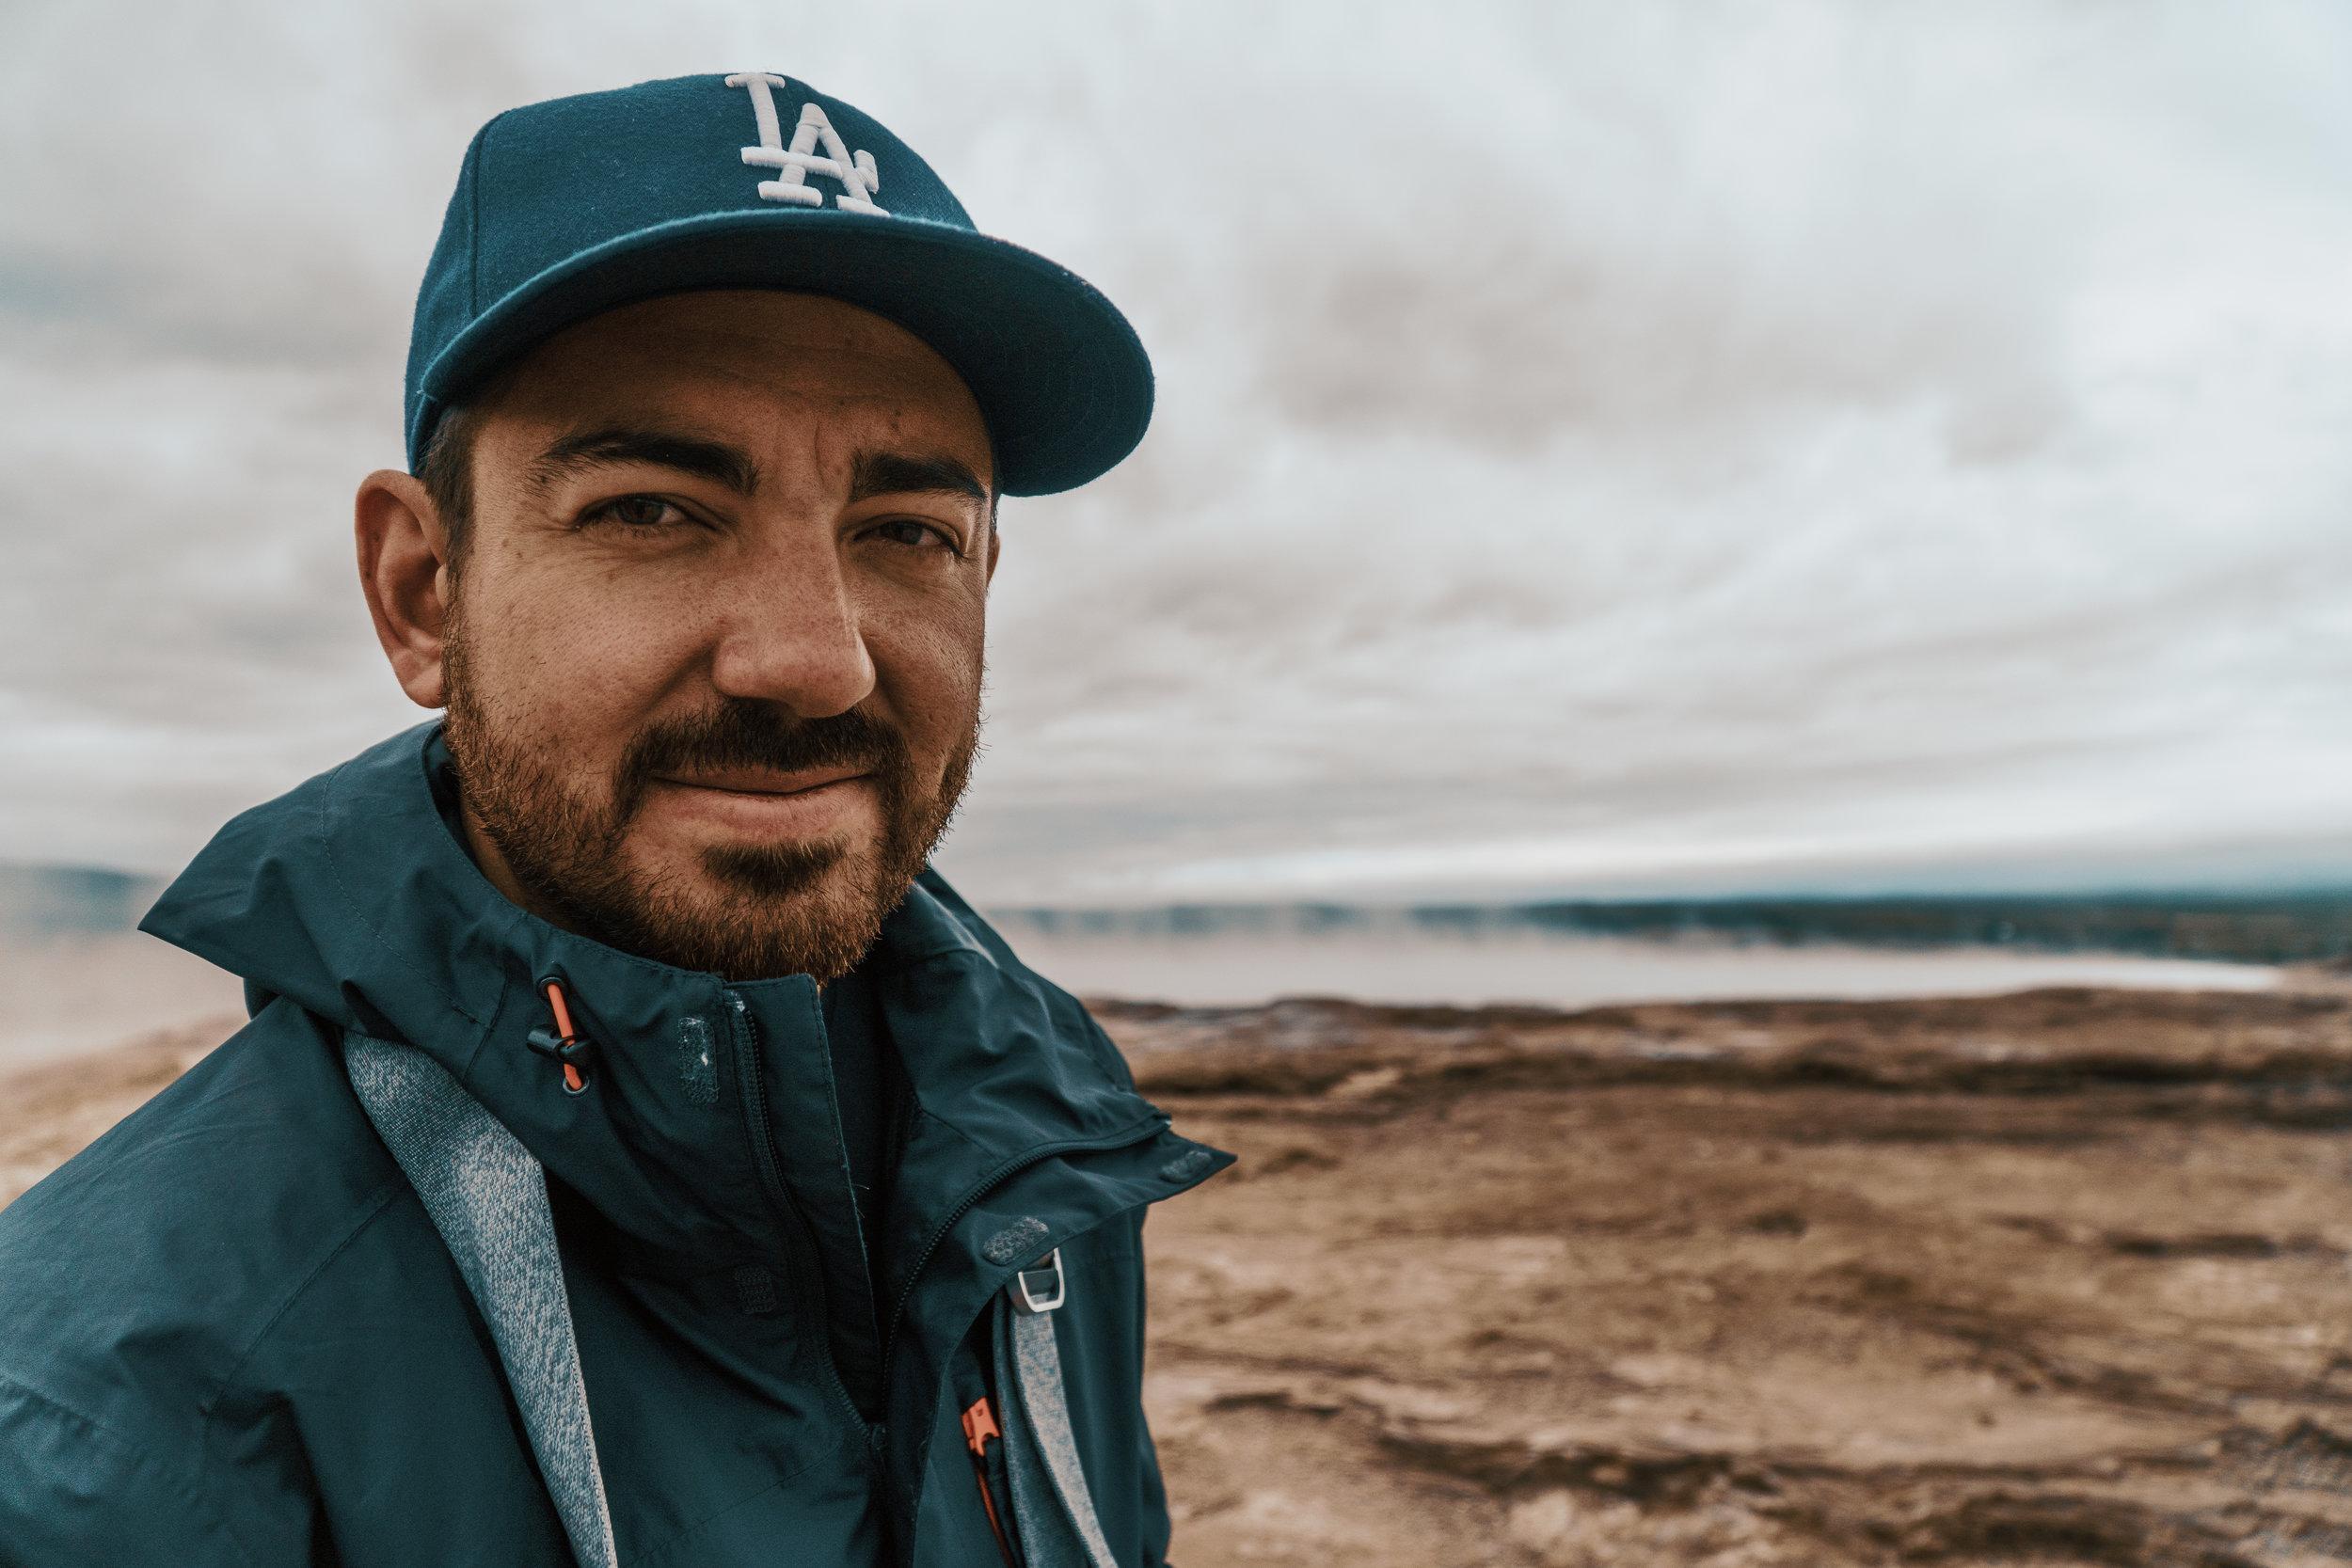 Matt Forero on his travels through Iceland. Photo Credit: Katelyn Forero